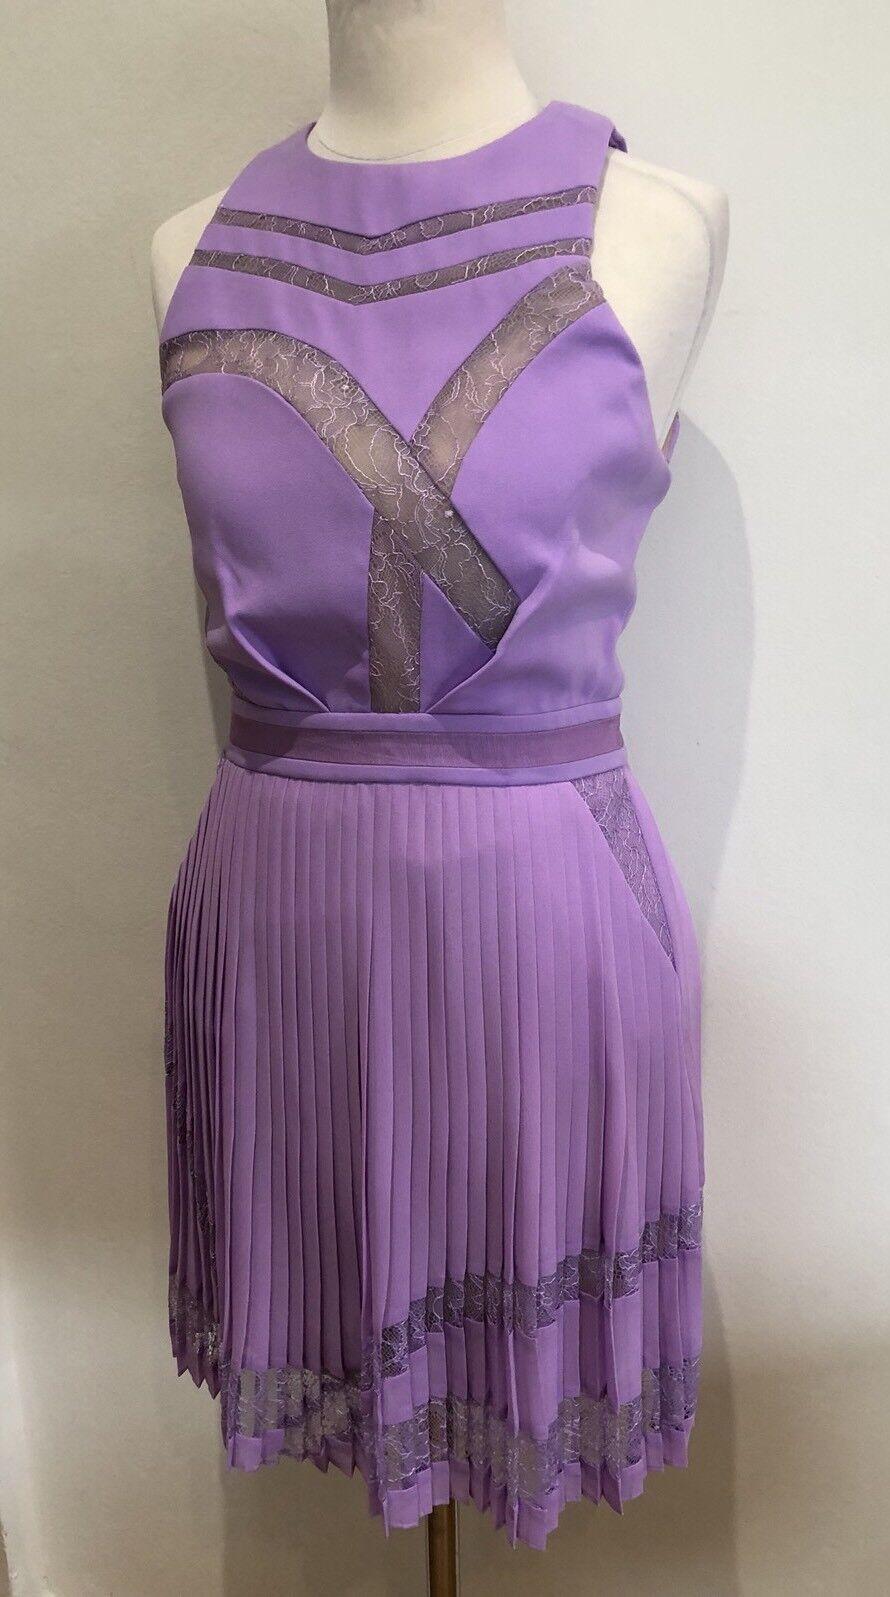 Three Floor Fashion Lilac Plated Lace Dress UK6